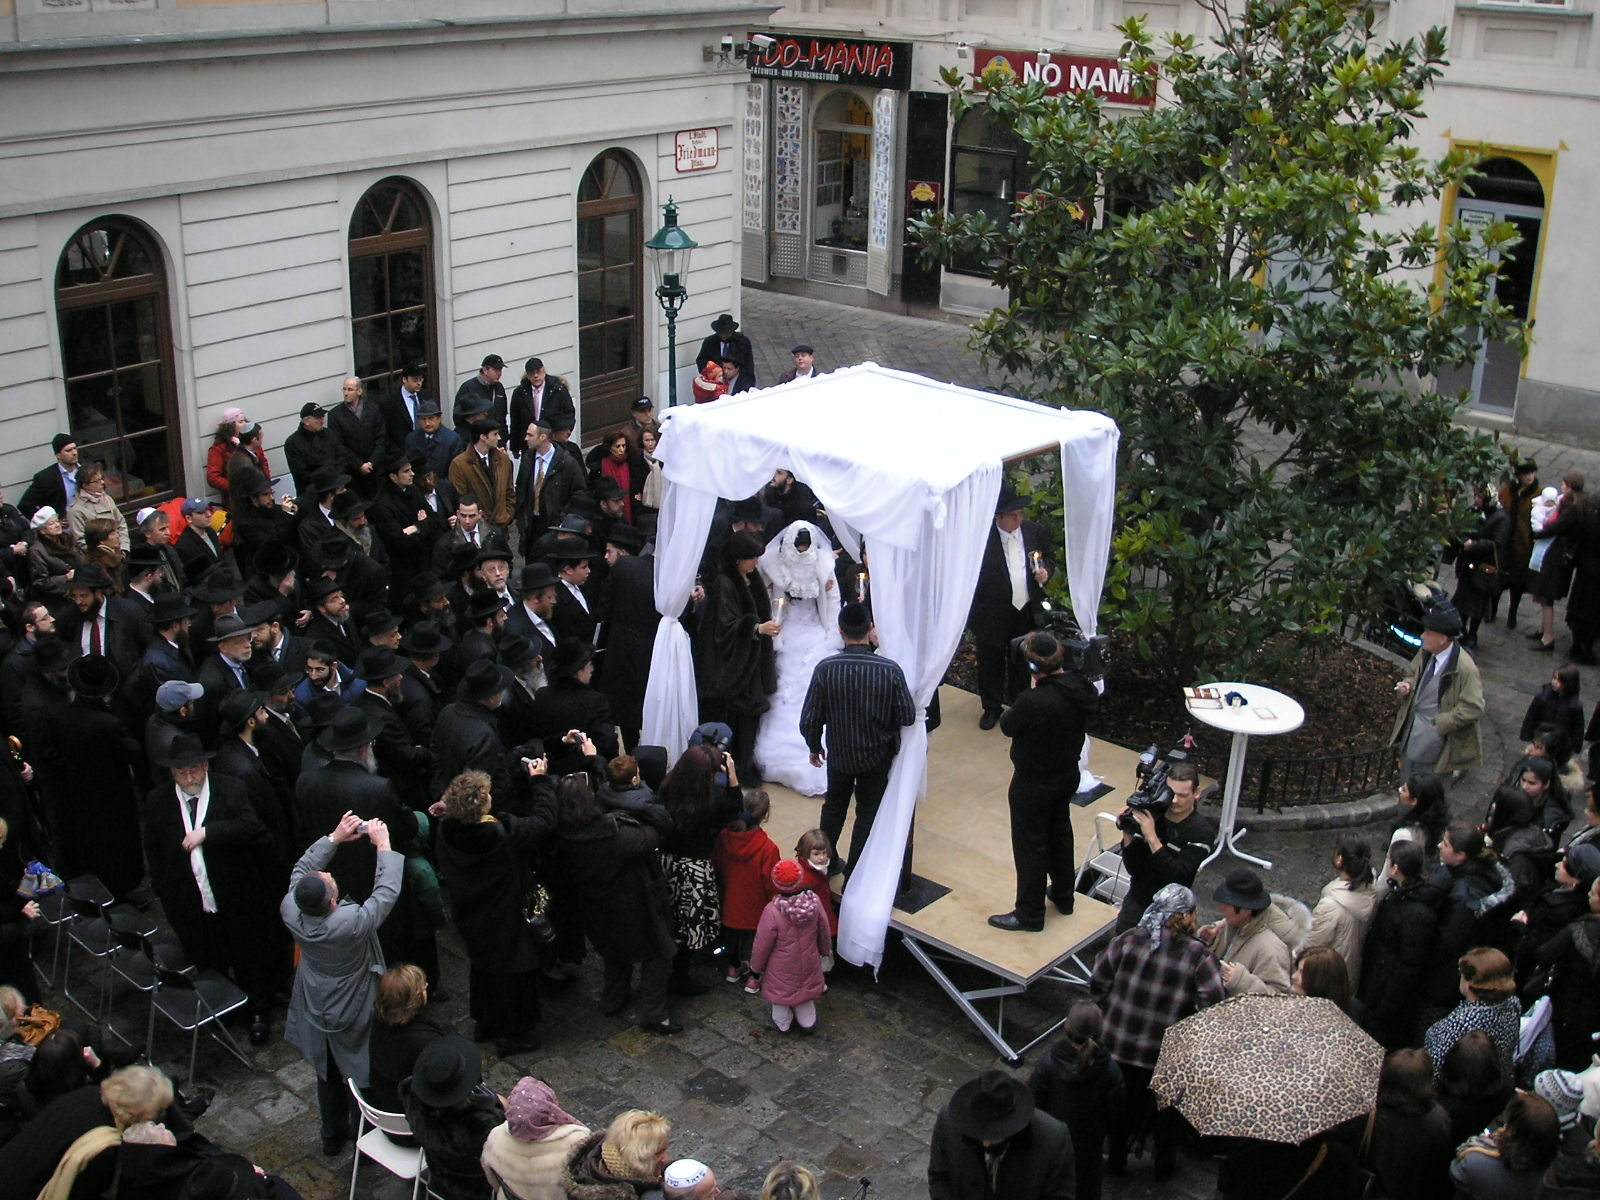 Jewish Wedding-Jewish Couple-Vienna-Marriage-Chuppah-Mount Sinai